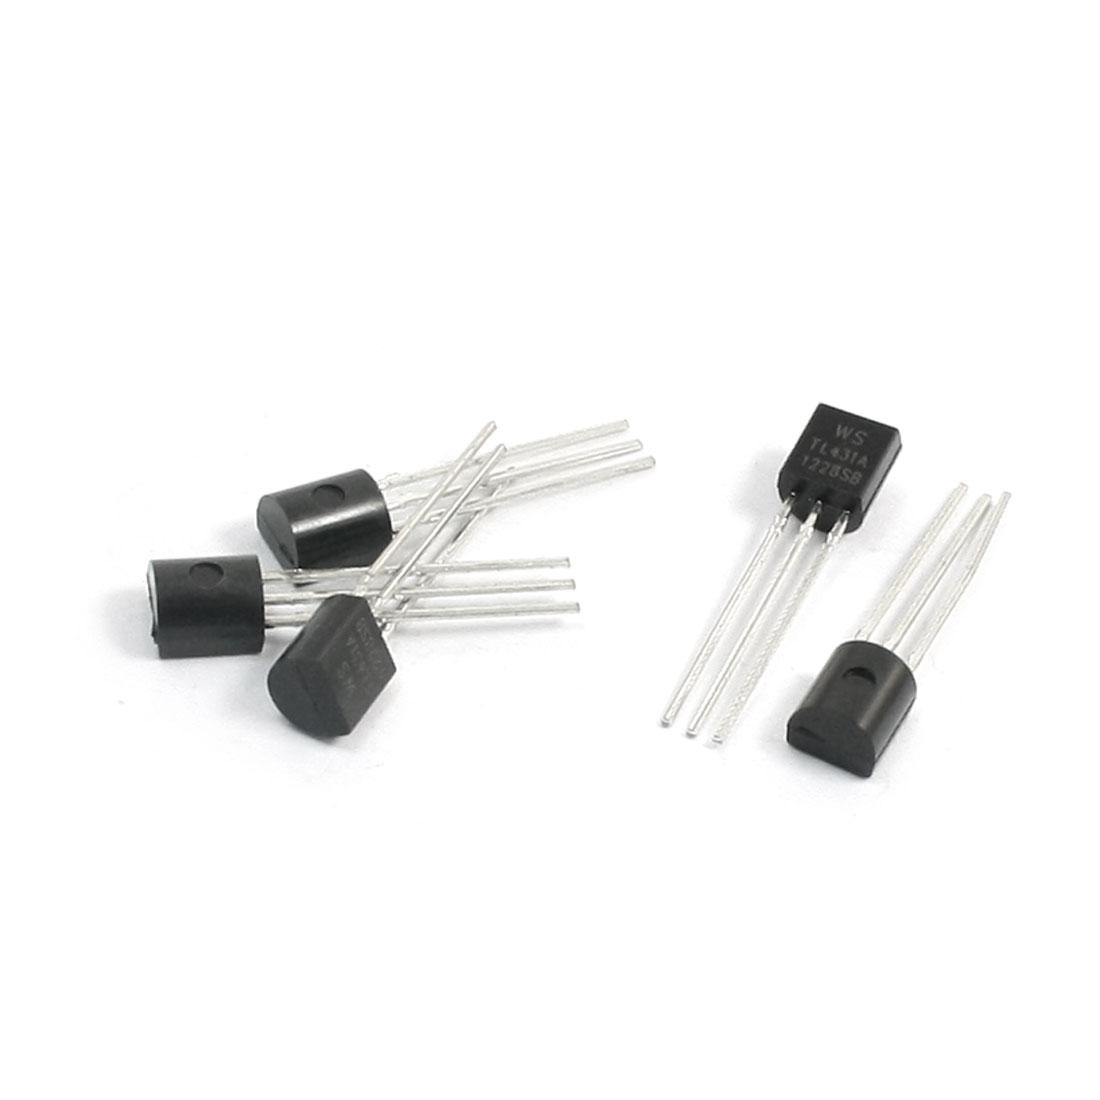 5Pcs TL431A TO-92 Type Adjustable Precision Shunt Regulator 2.5-36V